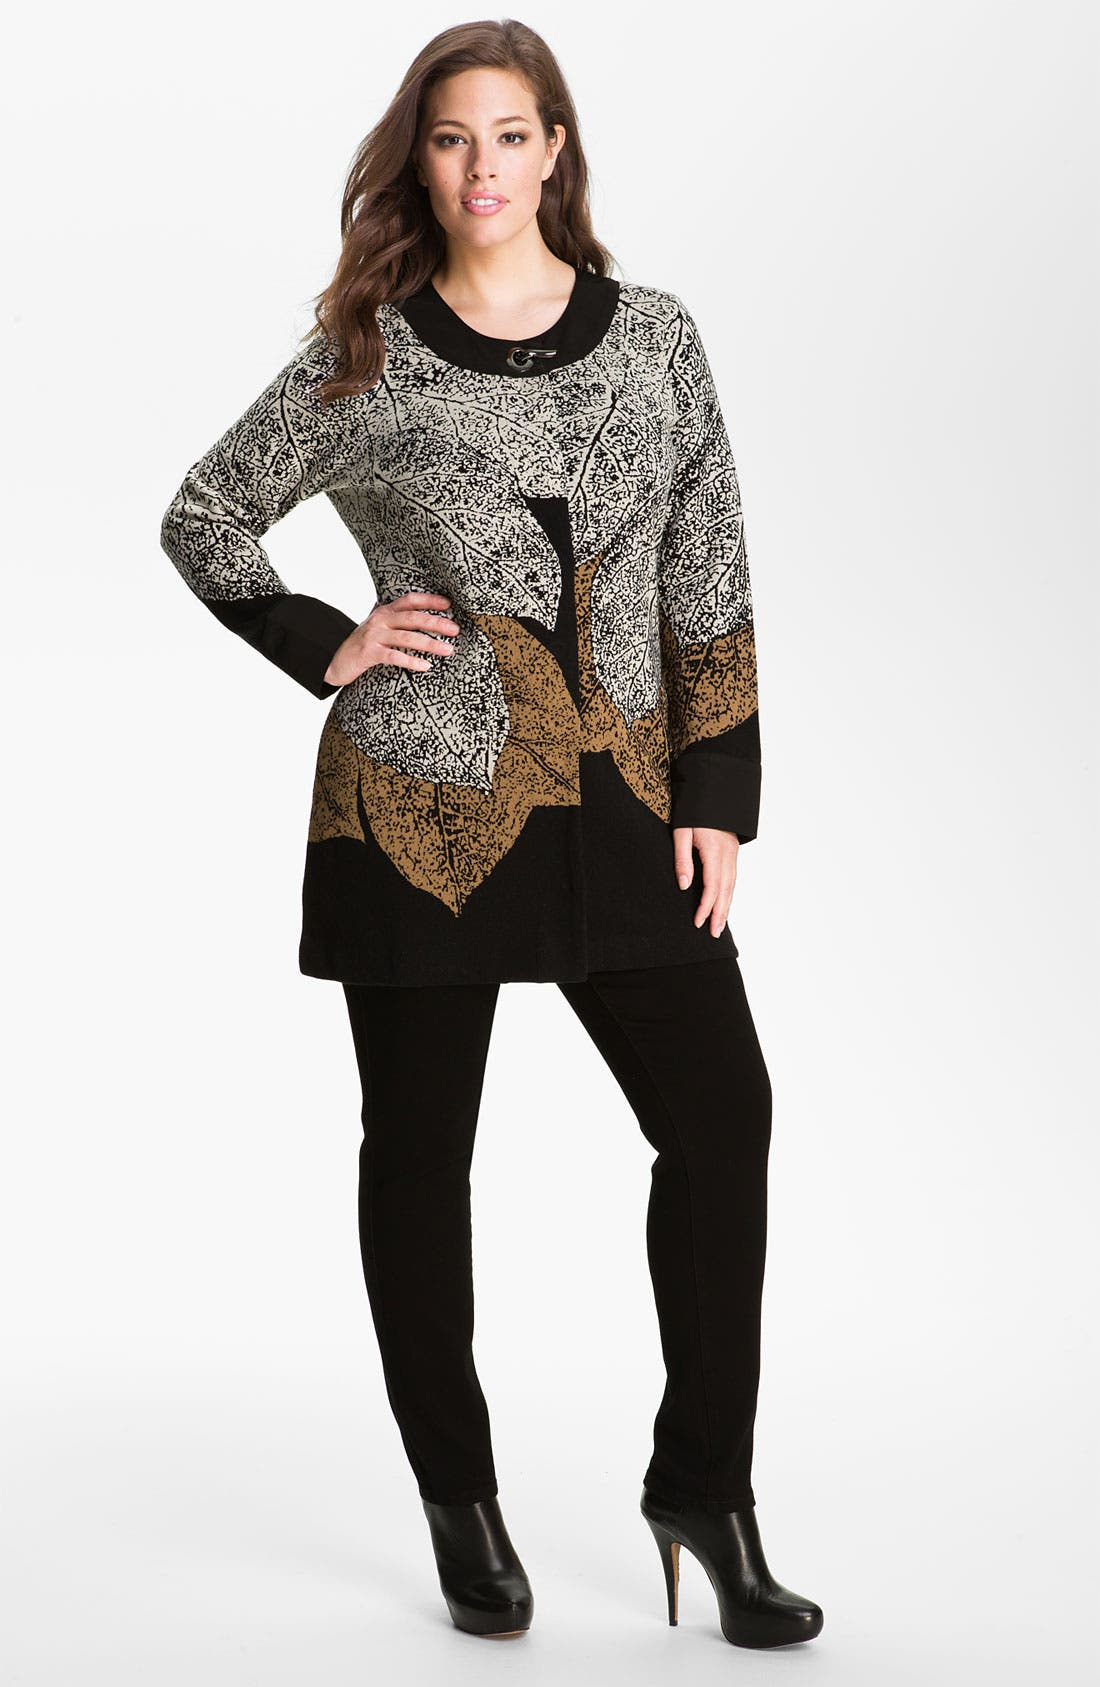 Alternate Image 1 Selected - Nic + Zoe 'Elegant Leaves' Sweater Jacket (Plus)